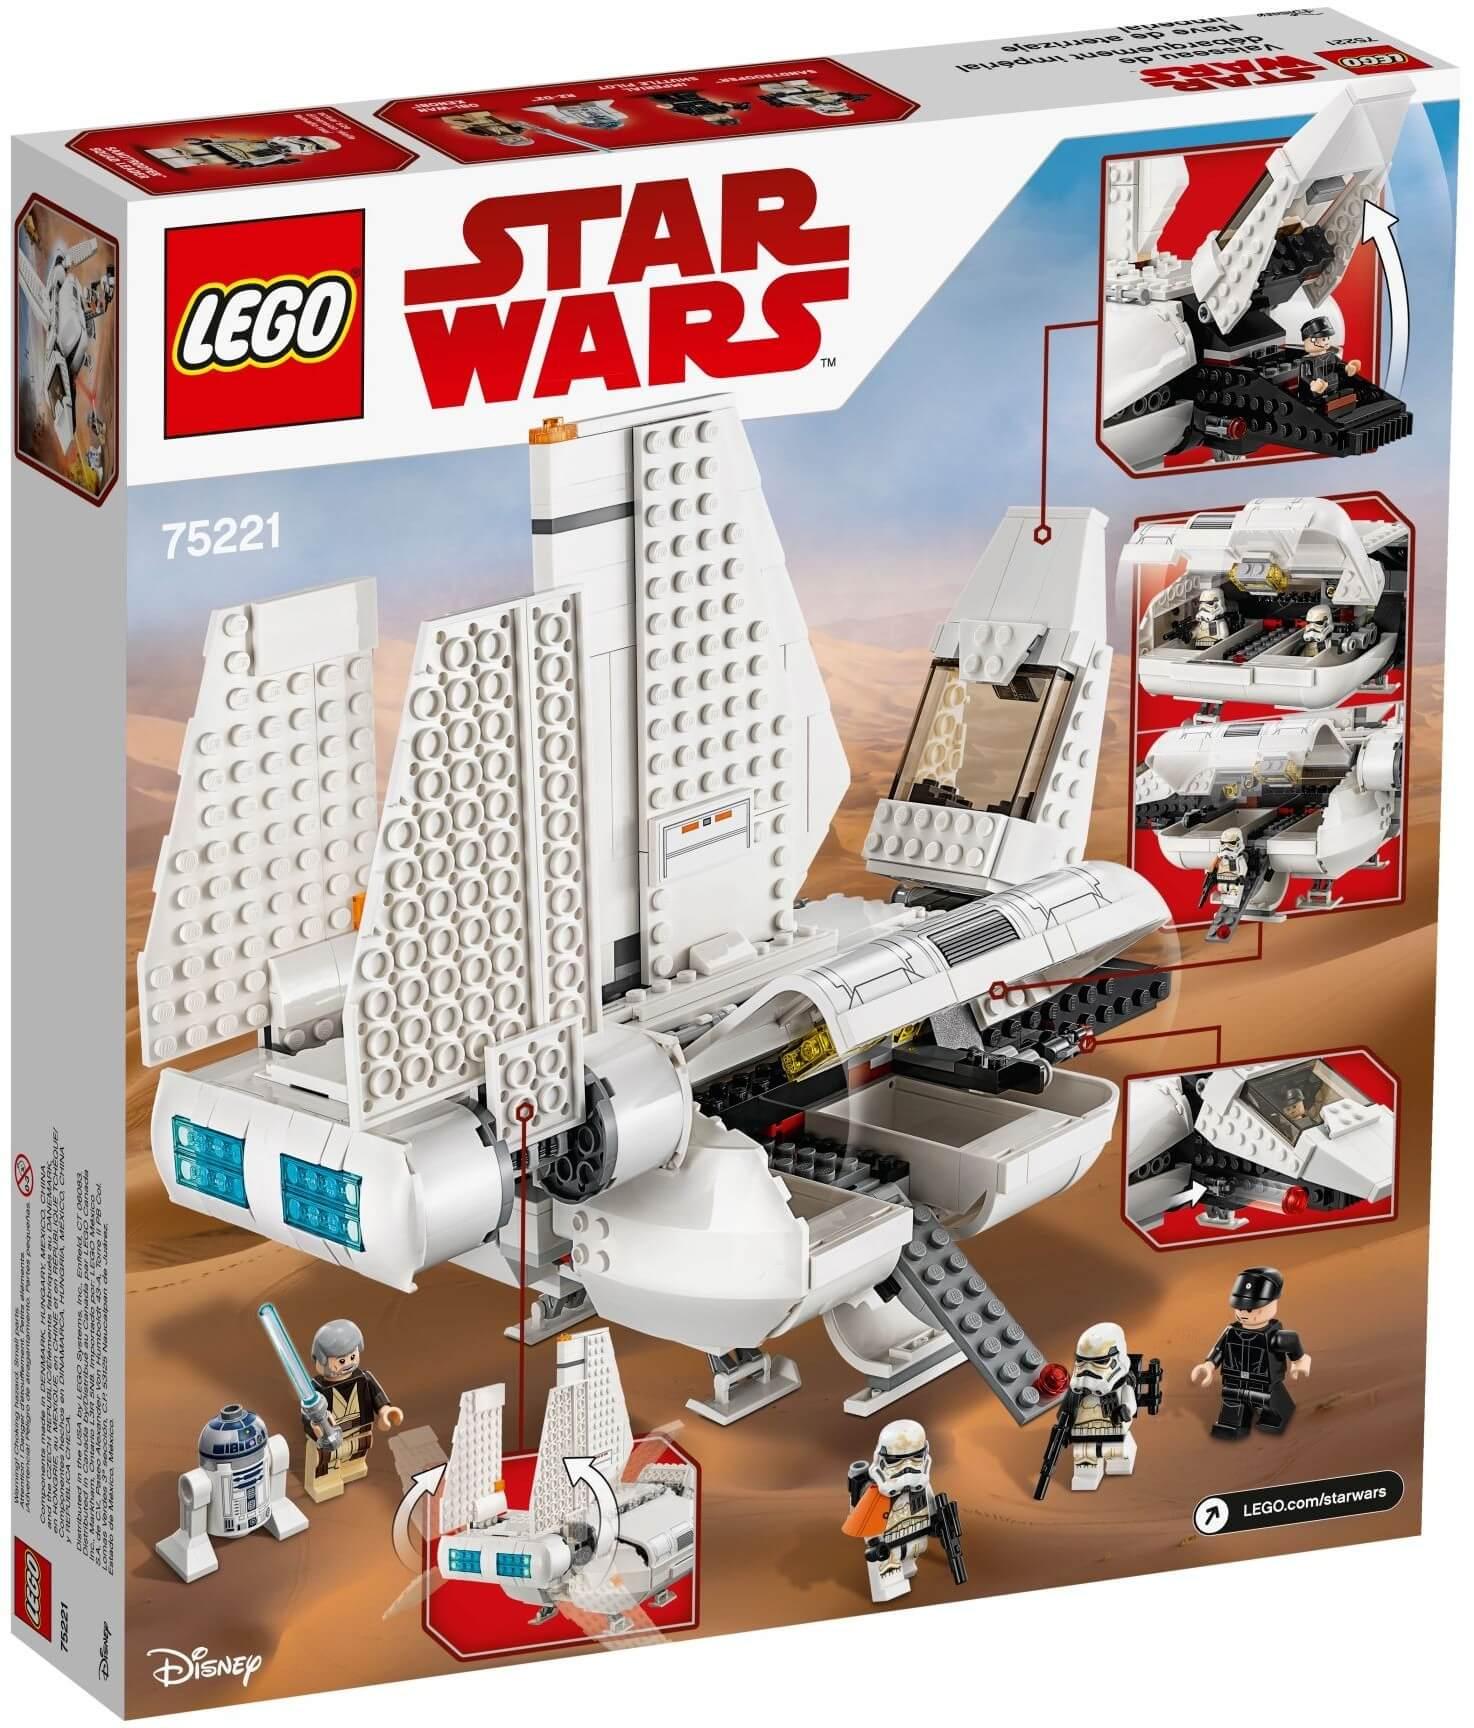 Mua đồ chơi LEGO 75221 - LEGO Star Wars 75221 - Tàu Vận Chuyển Hoàng Gia (LEGO 75221 Imperial Landing Craft)